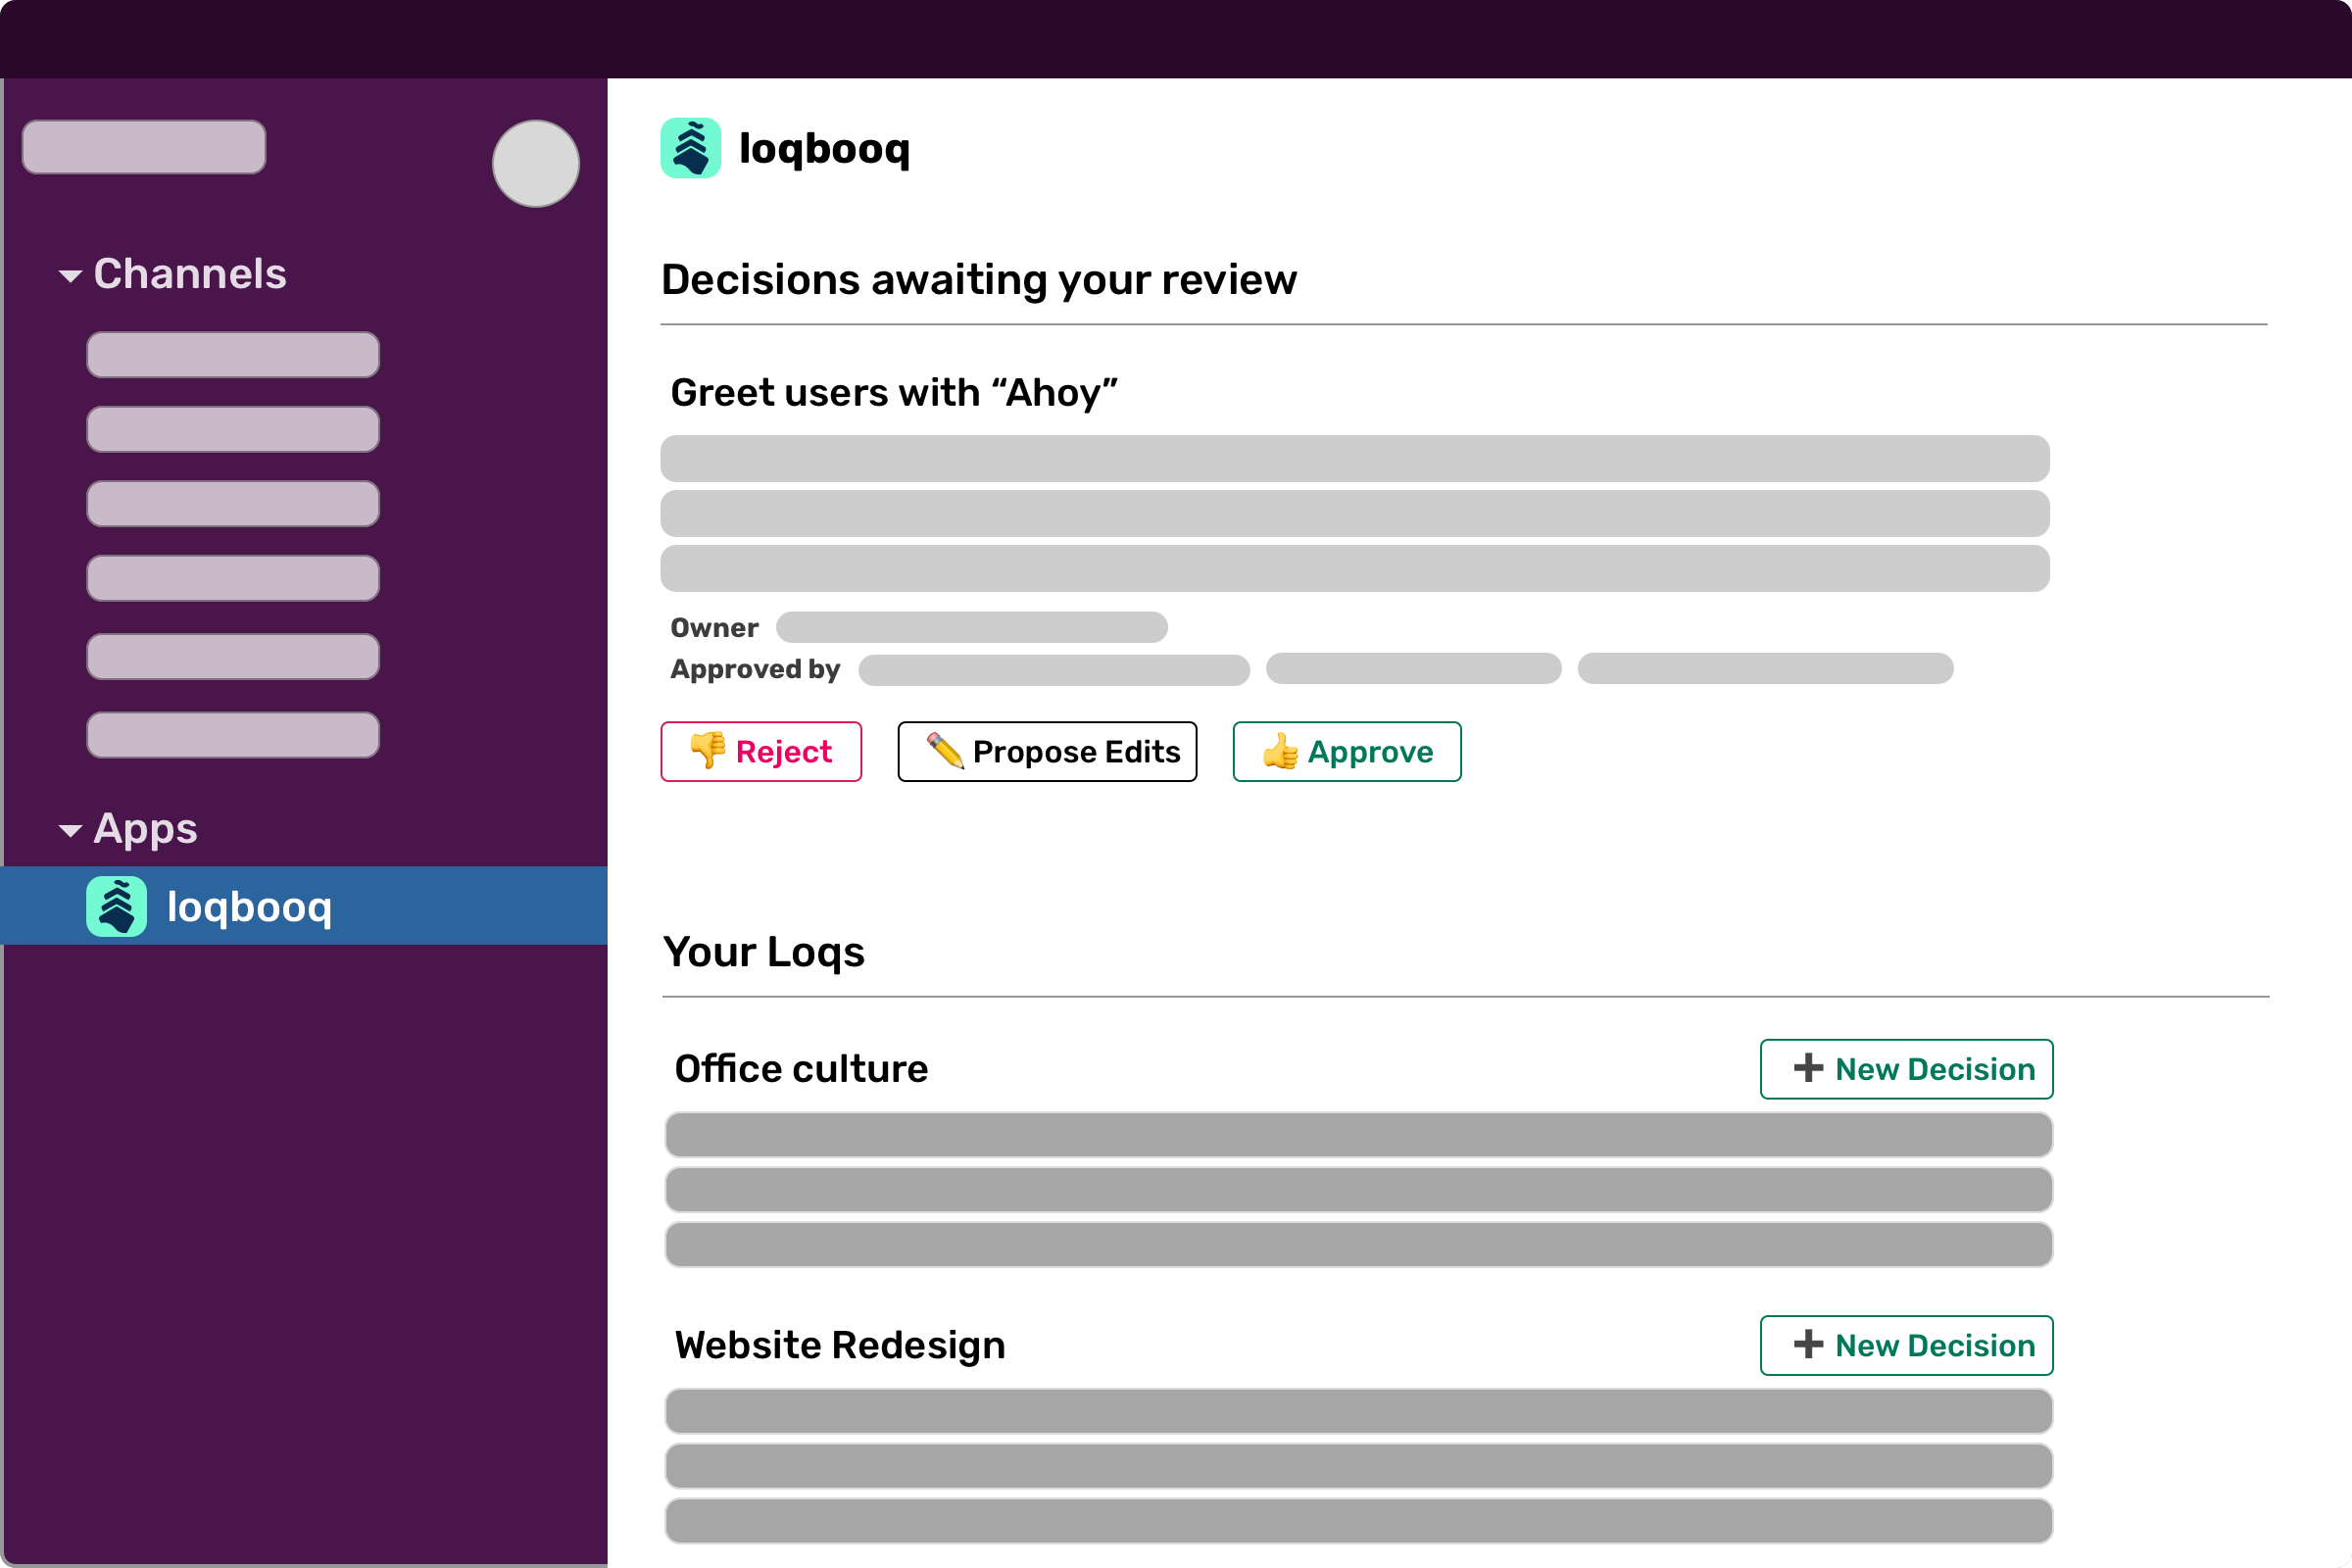 Screenshot of Loqbooq App Home view in Slack